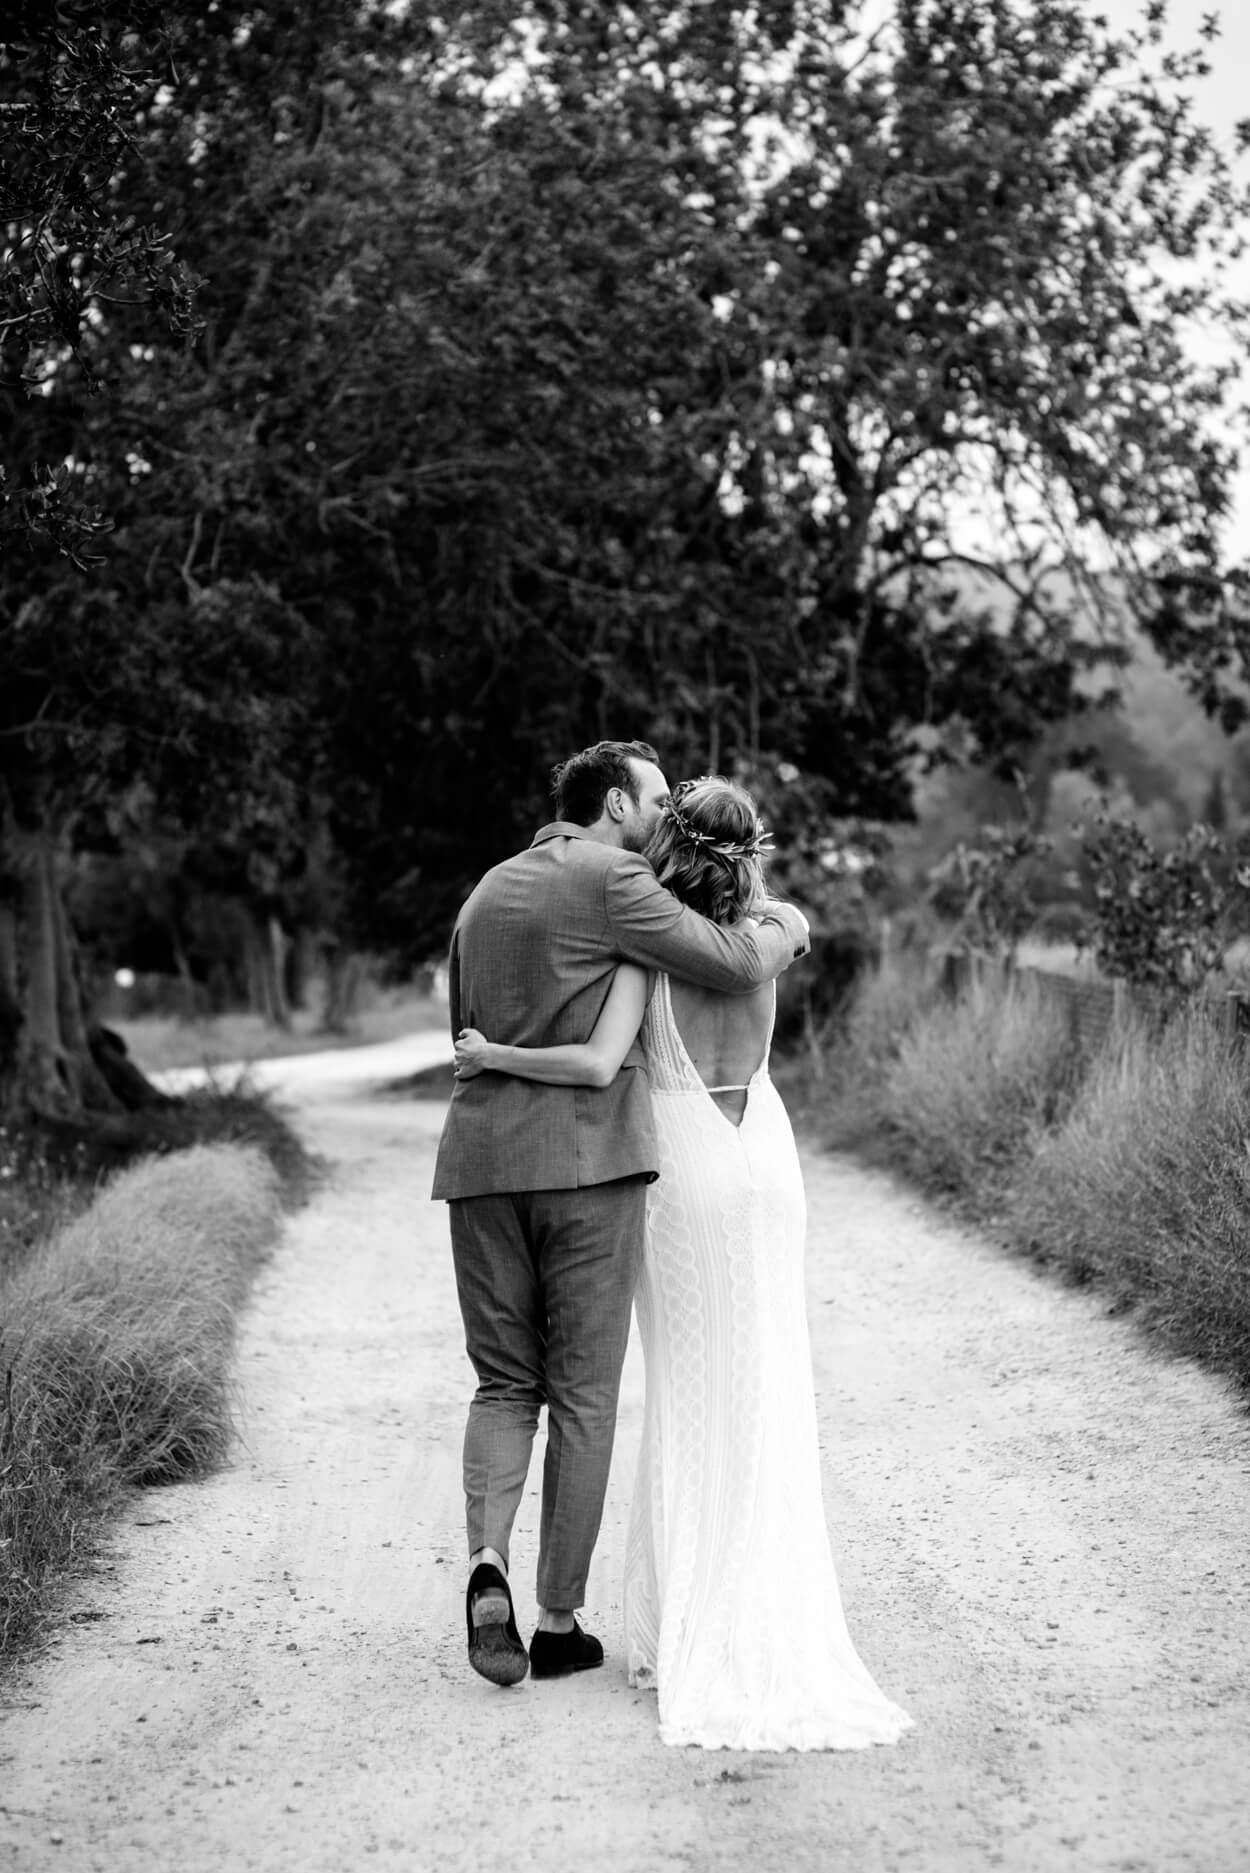 bride groom country walk path camino algaroba carob tree